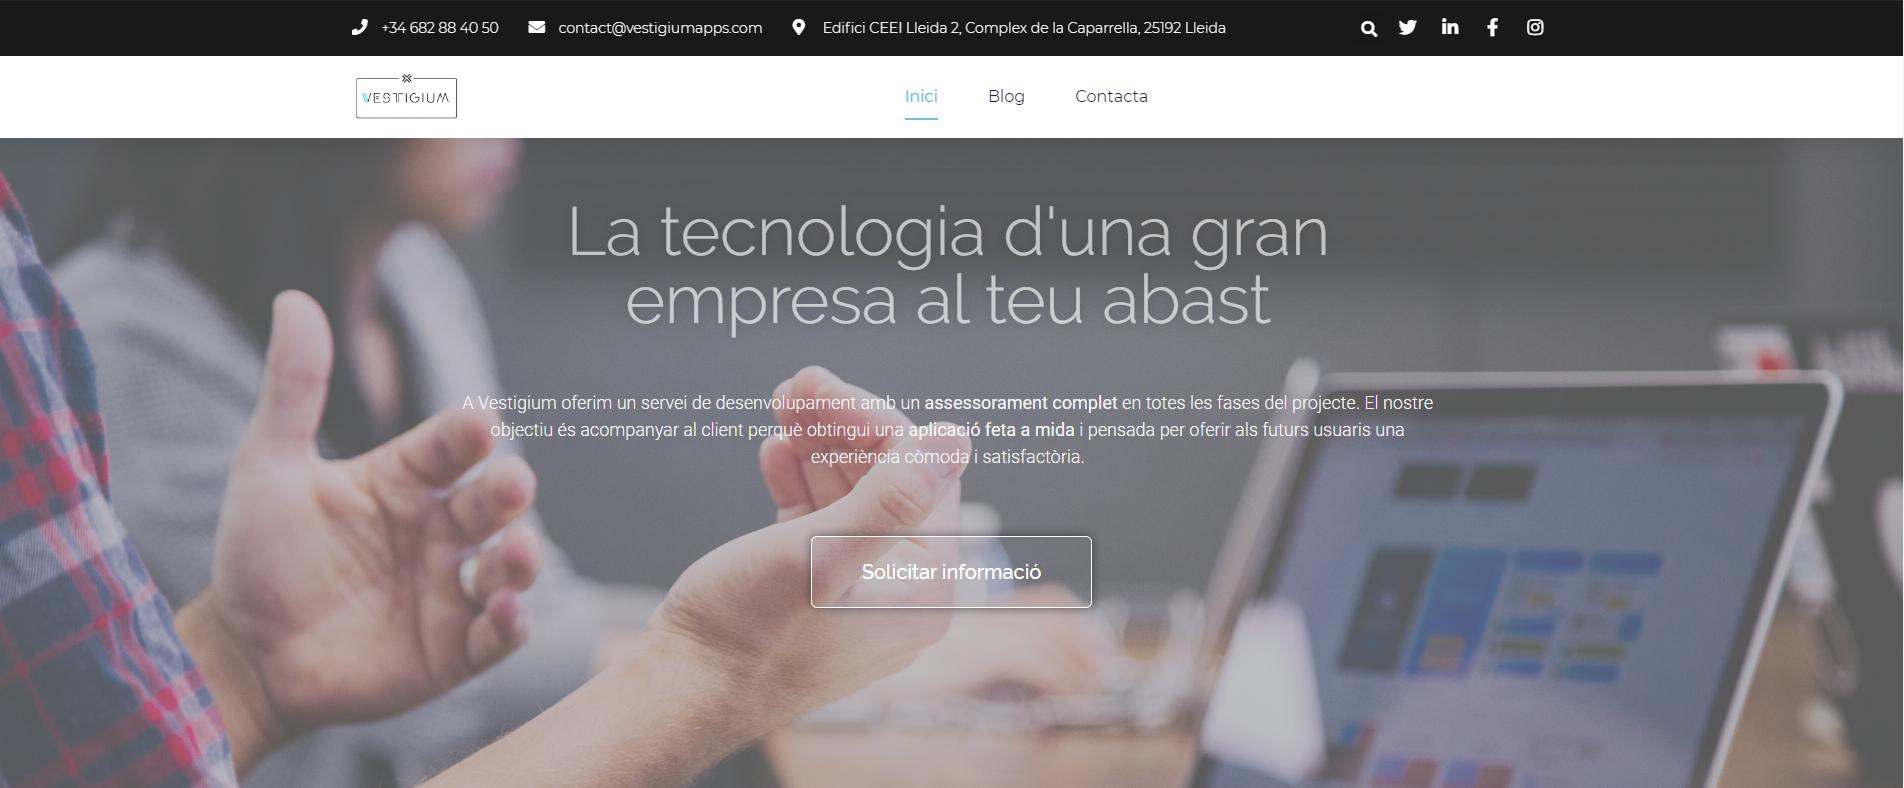 web pro